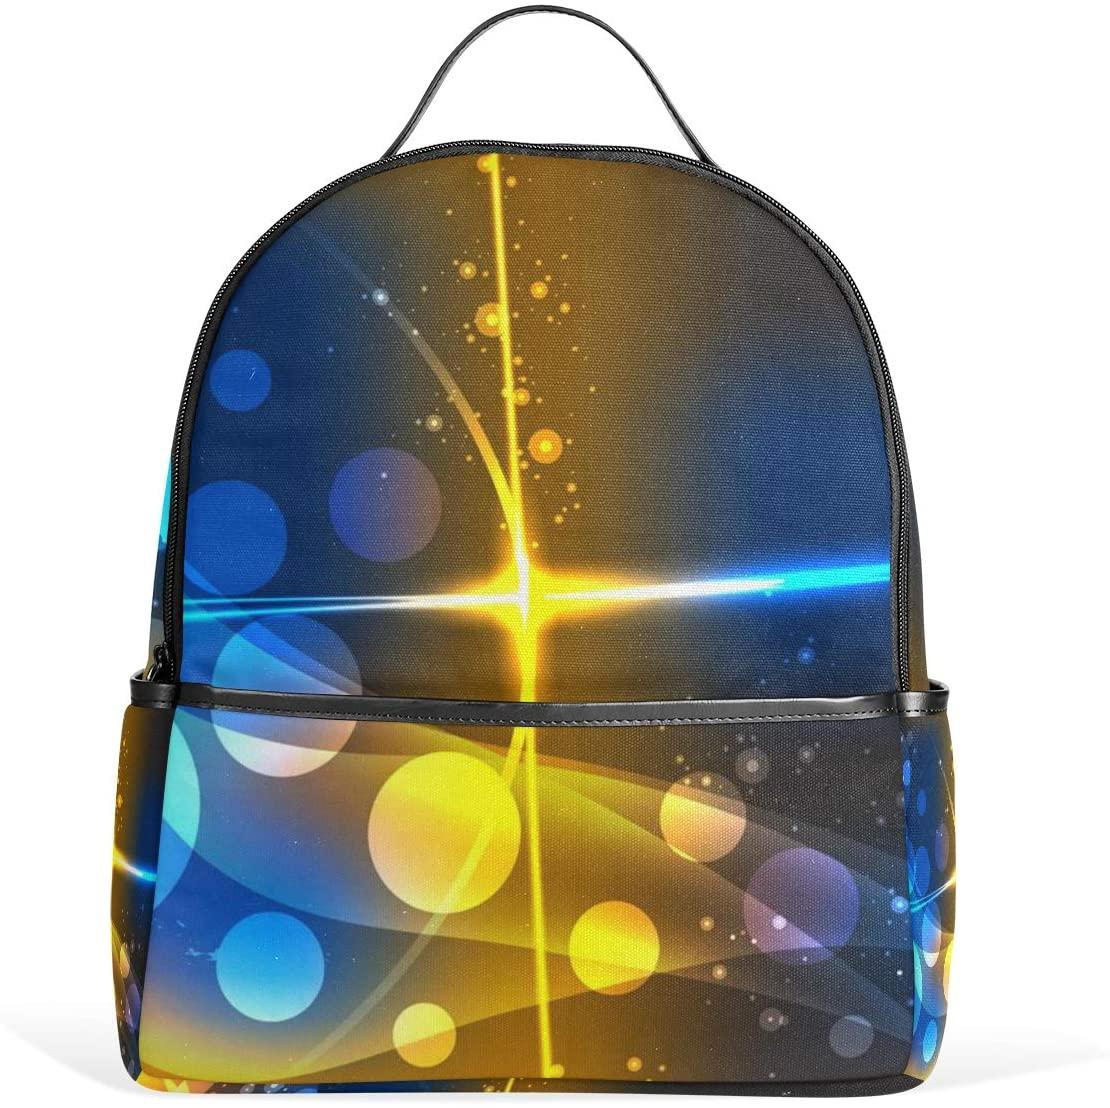 Kids' School Backpack Orange Blue Light Bookbag for Boys Girls Lightweight Casual Travel Bag Large Capacity Daypack